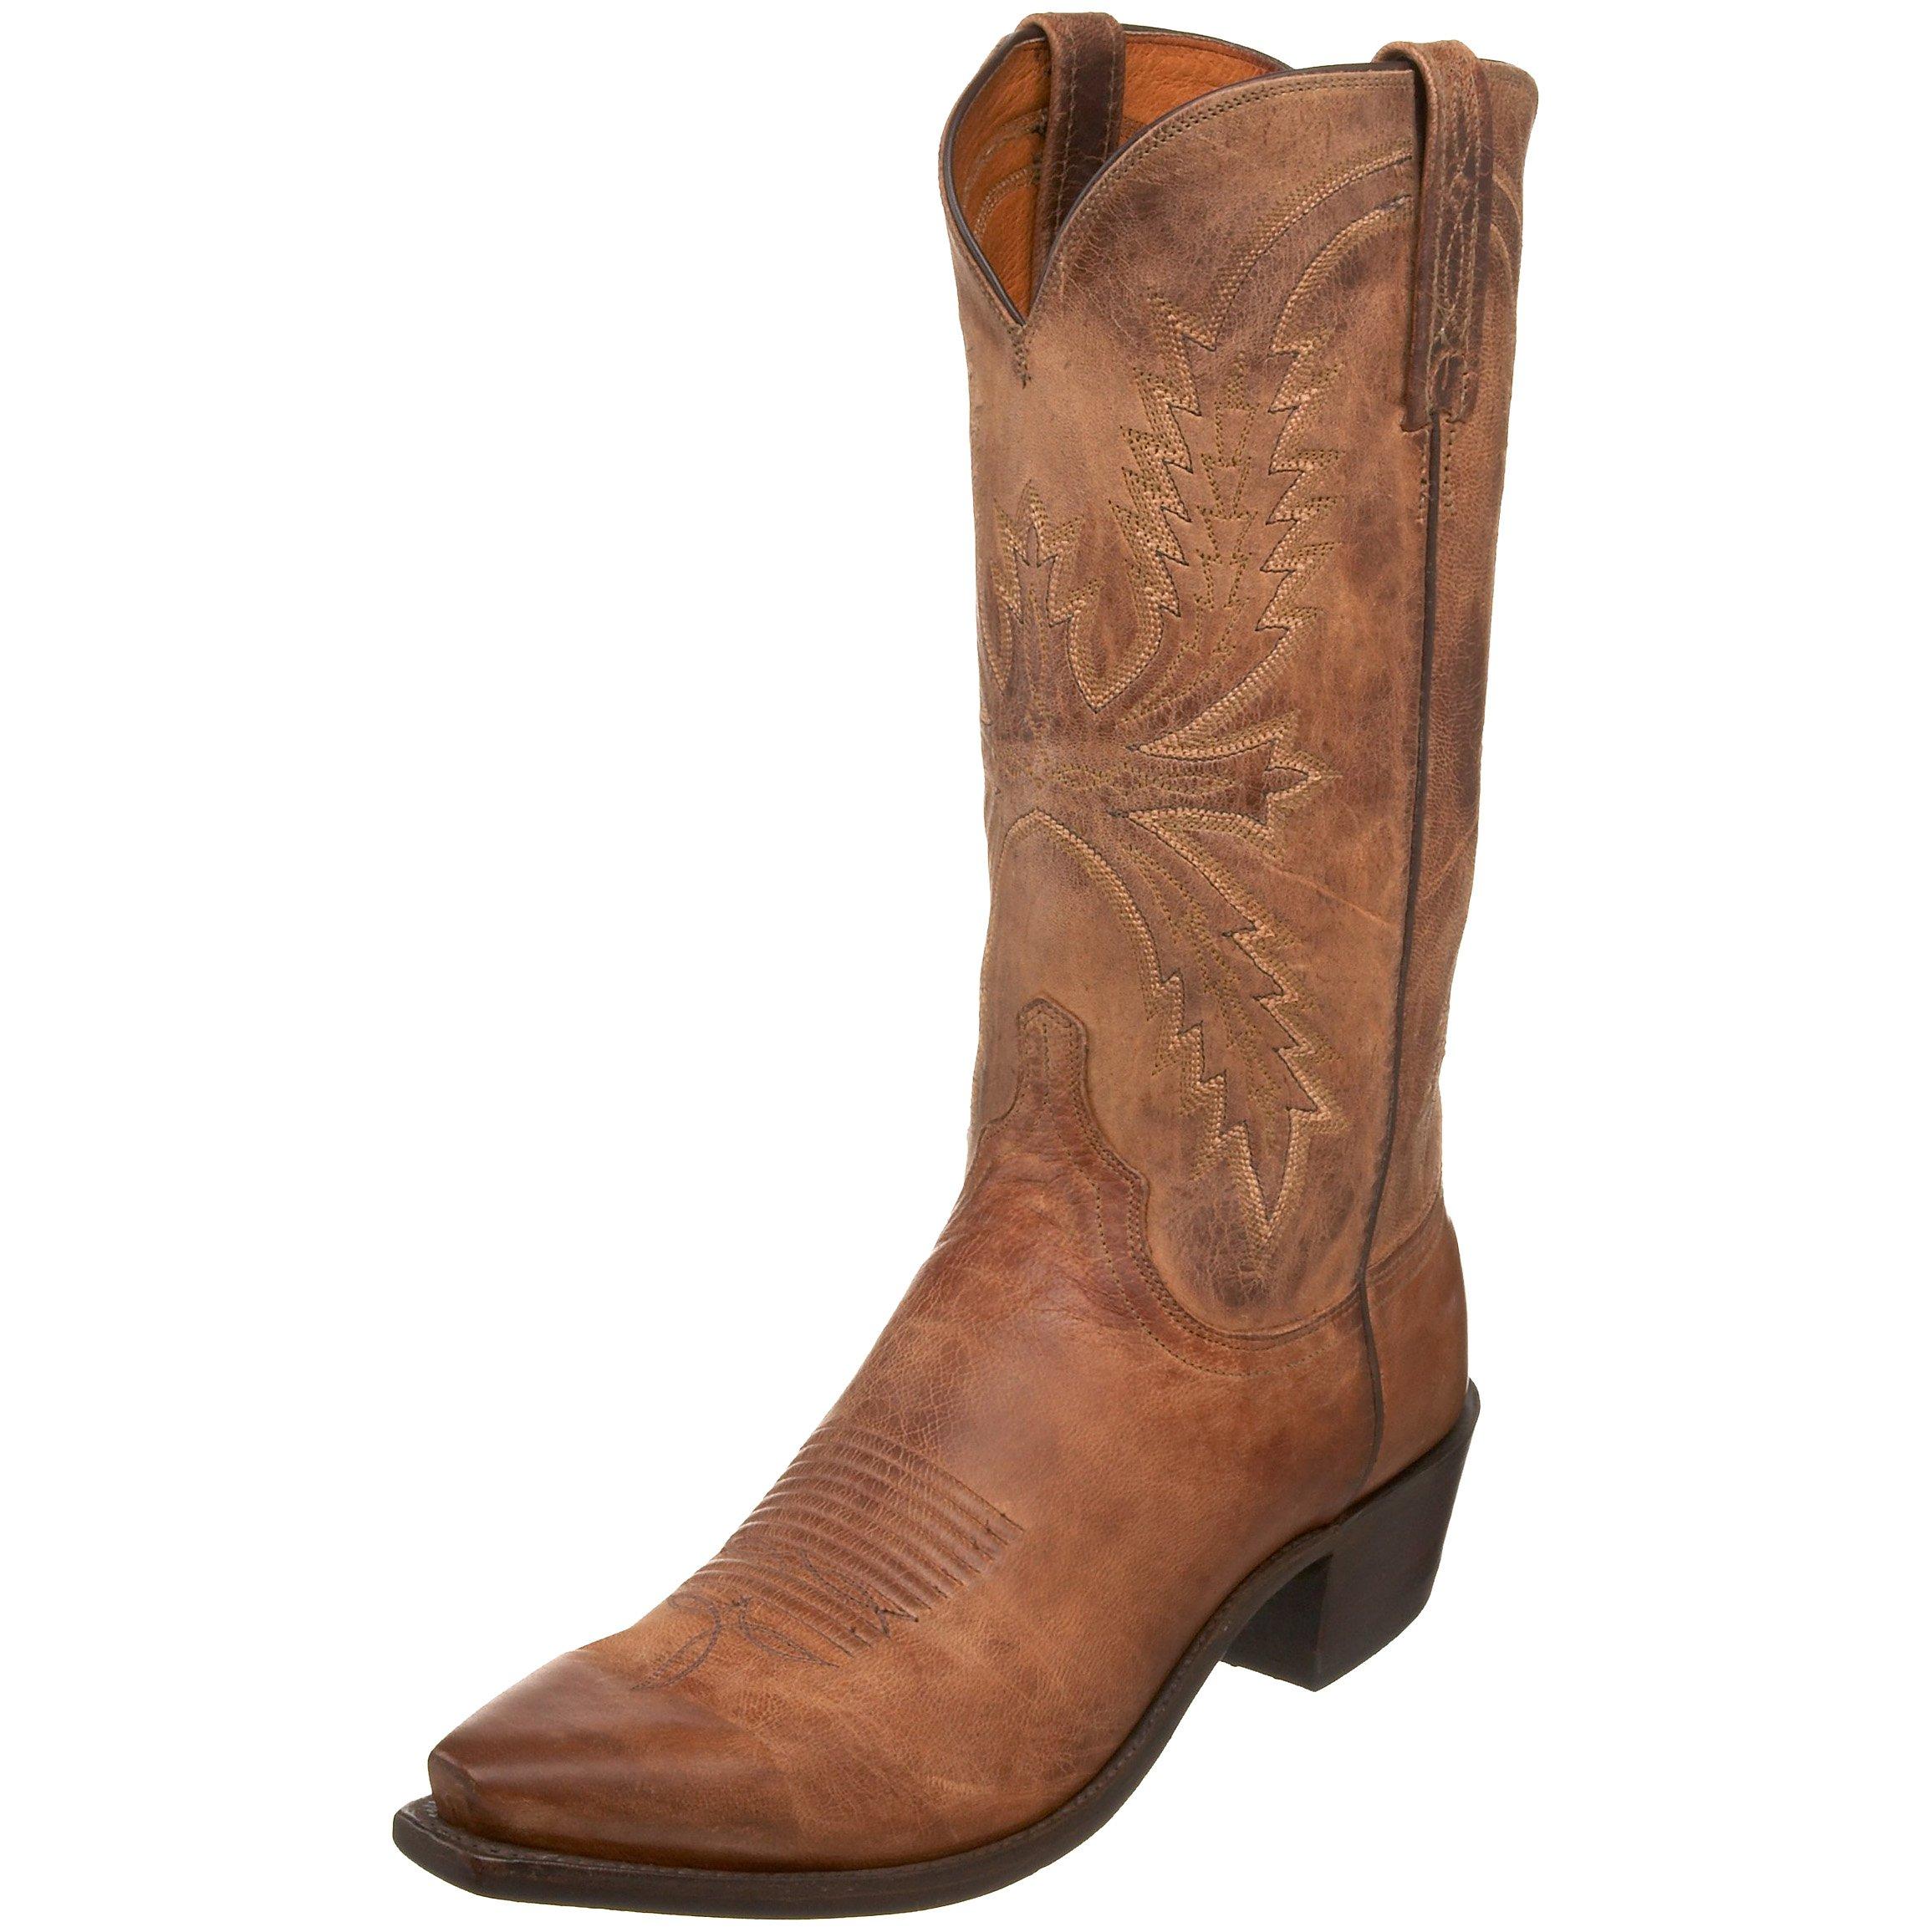 1883 by Lucchese Men's N1547.54 Western Boot,Tan,12 EE US